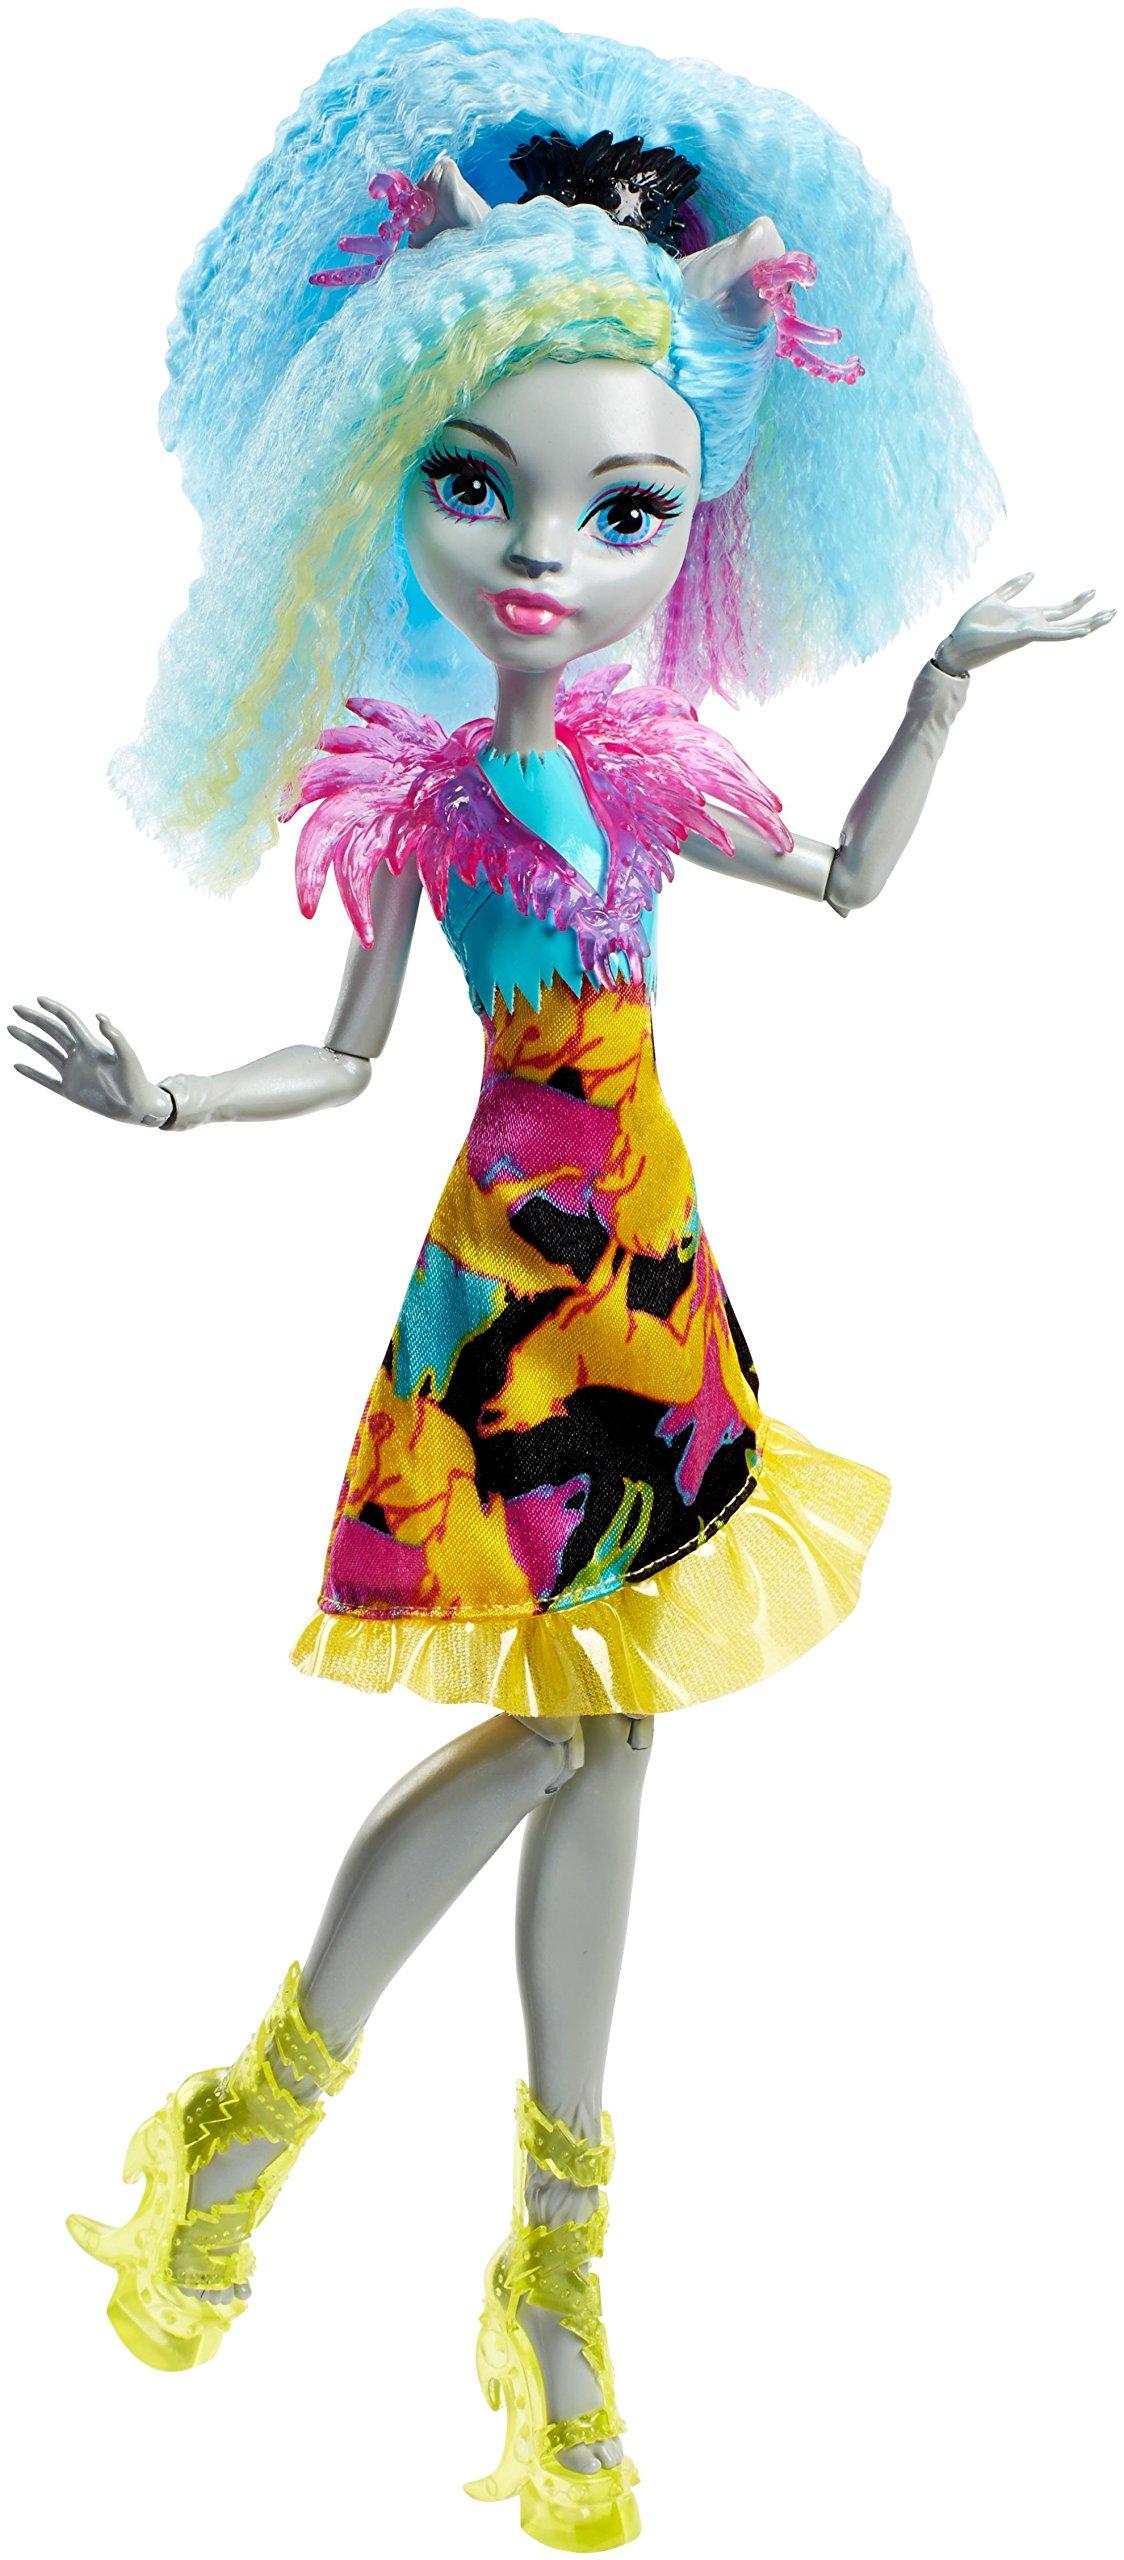 Monster High Electrified Hair-raising Ghouls Silvi Timberwolf Doll by Monster High